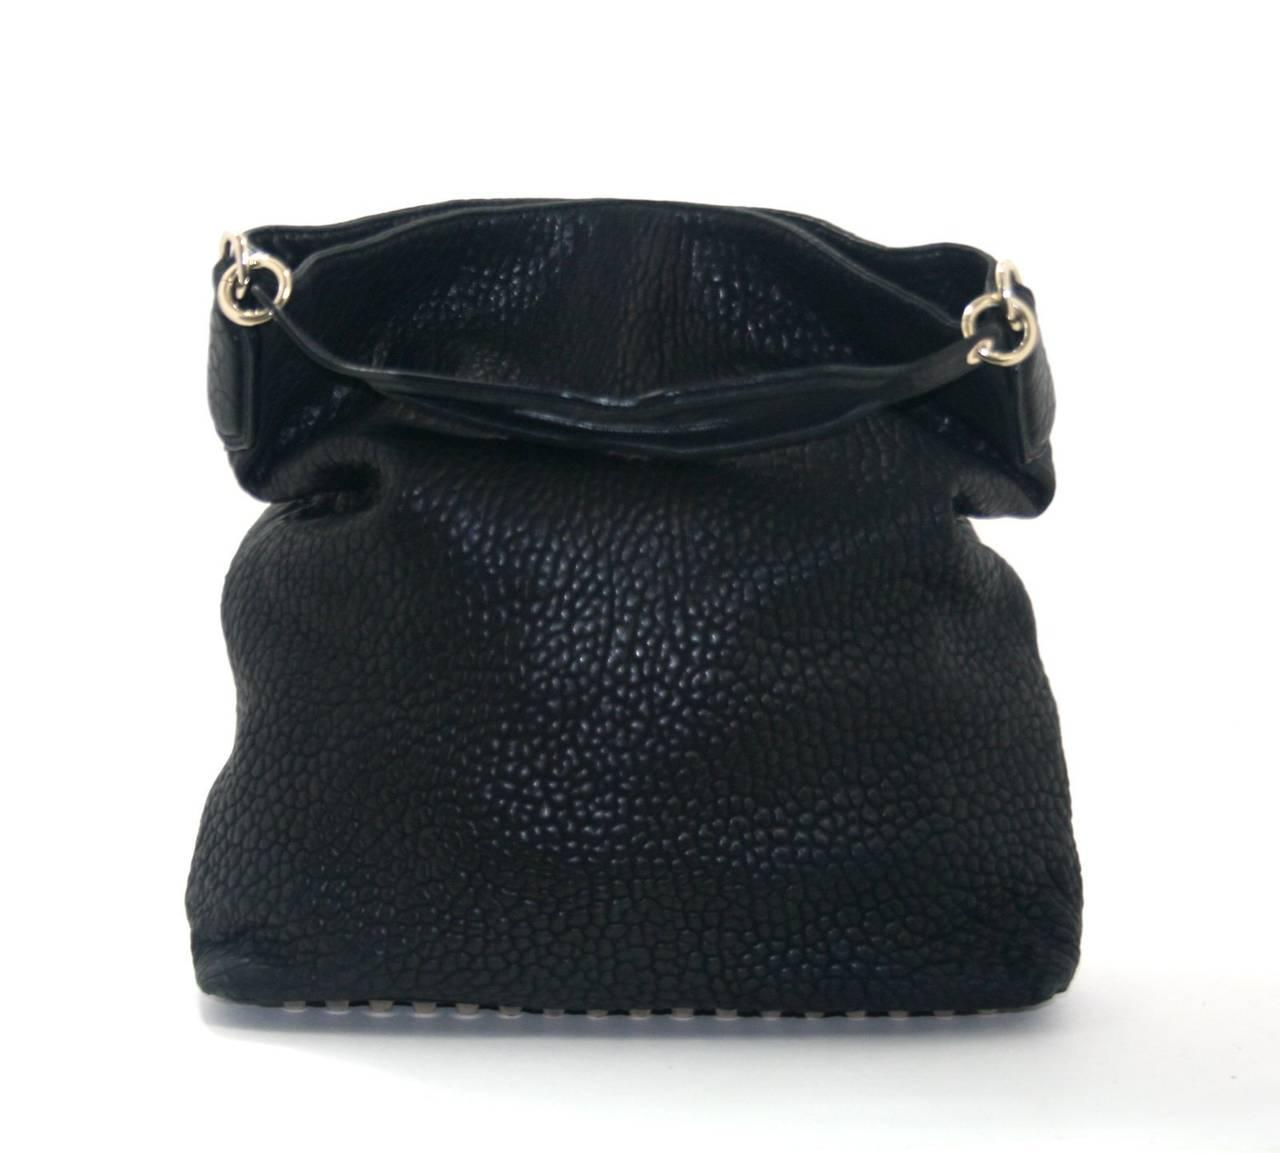 Alexander Wang Darcy Stud Bottom Hobo in Black Pebbled Leather 2